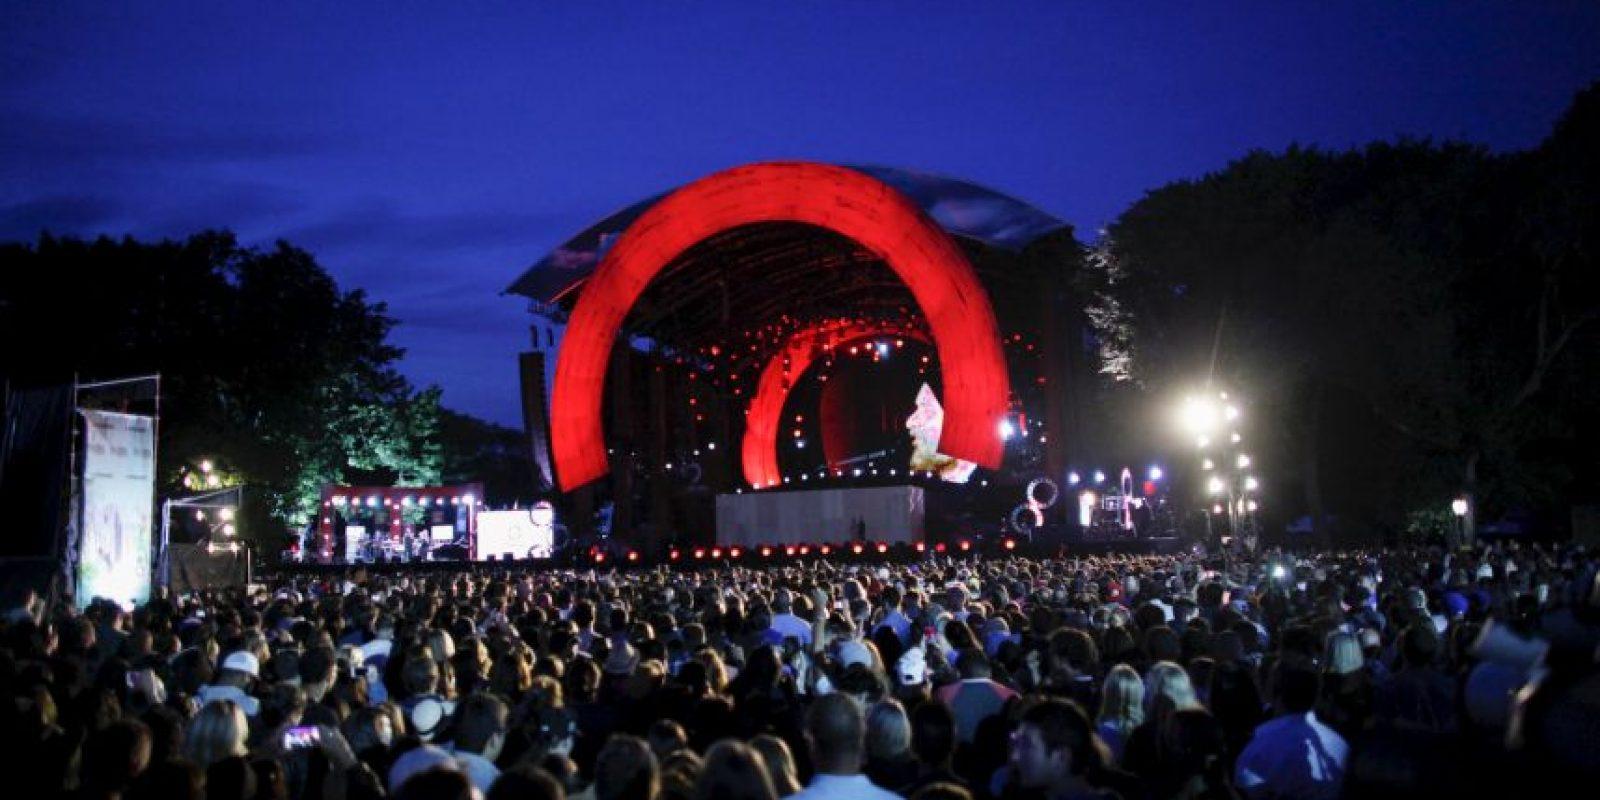 El festival Global Citizen se llevó a cabo en Central Park de Nueva York. Foto:Getty Images